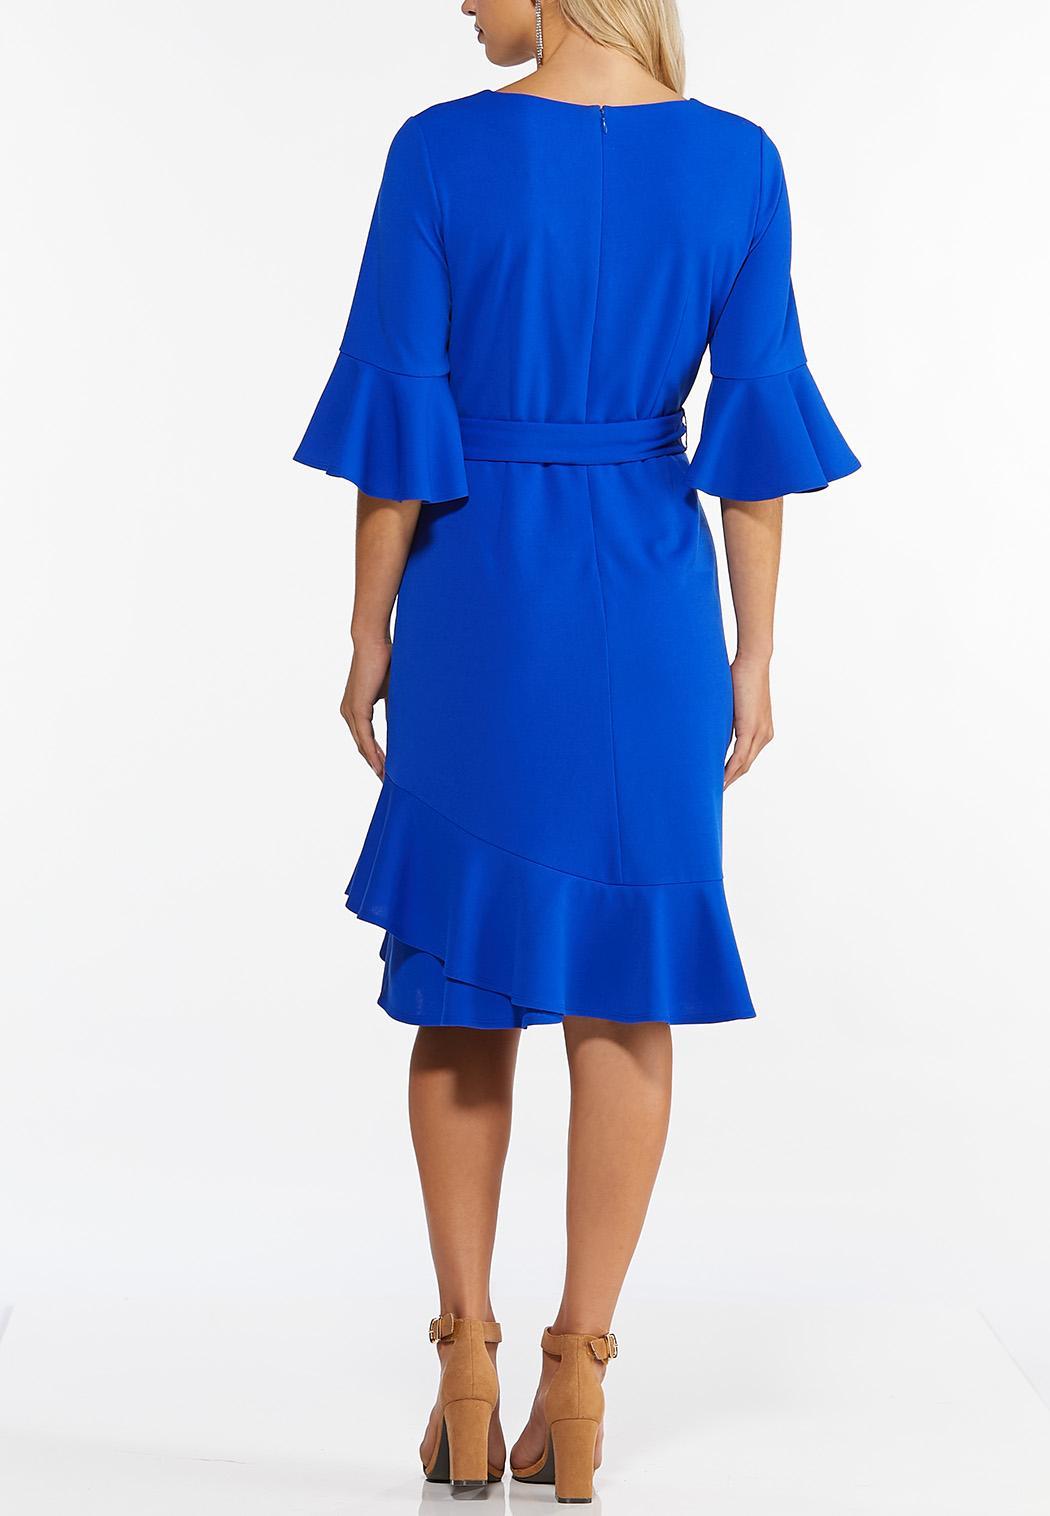 Blue Ruffled Trim Dress (Item #44440386)